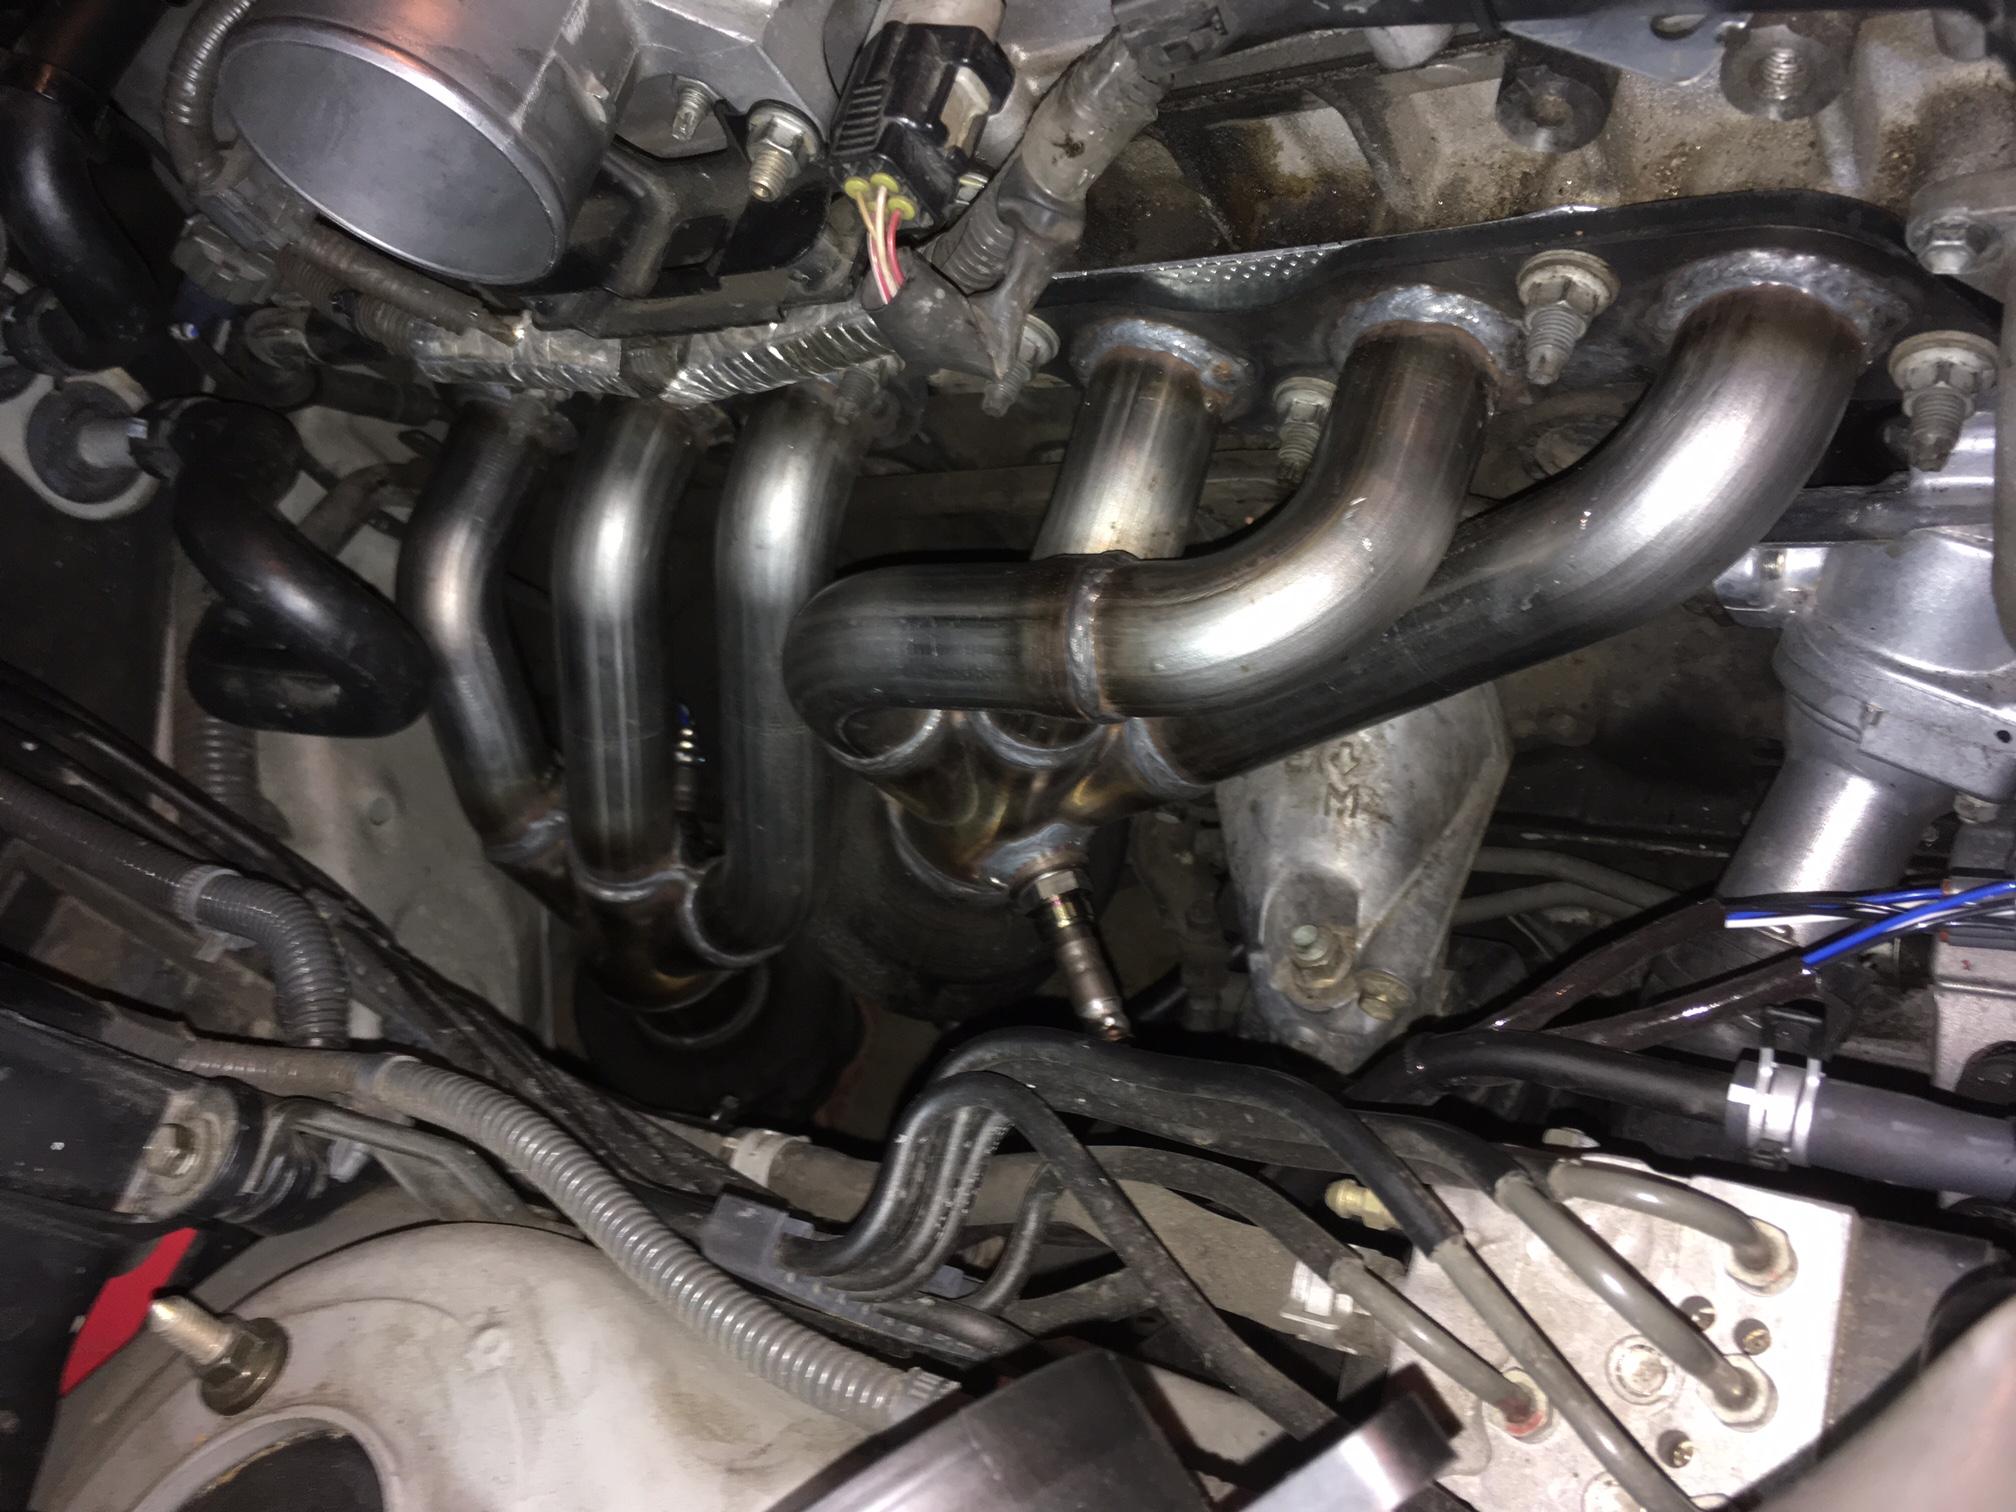 Magnaflow 452843 Exhaust Manifold & Catalytic Convertor...-img_5097.jpg